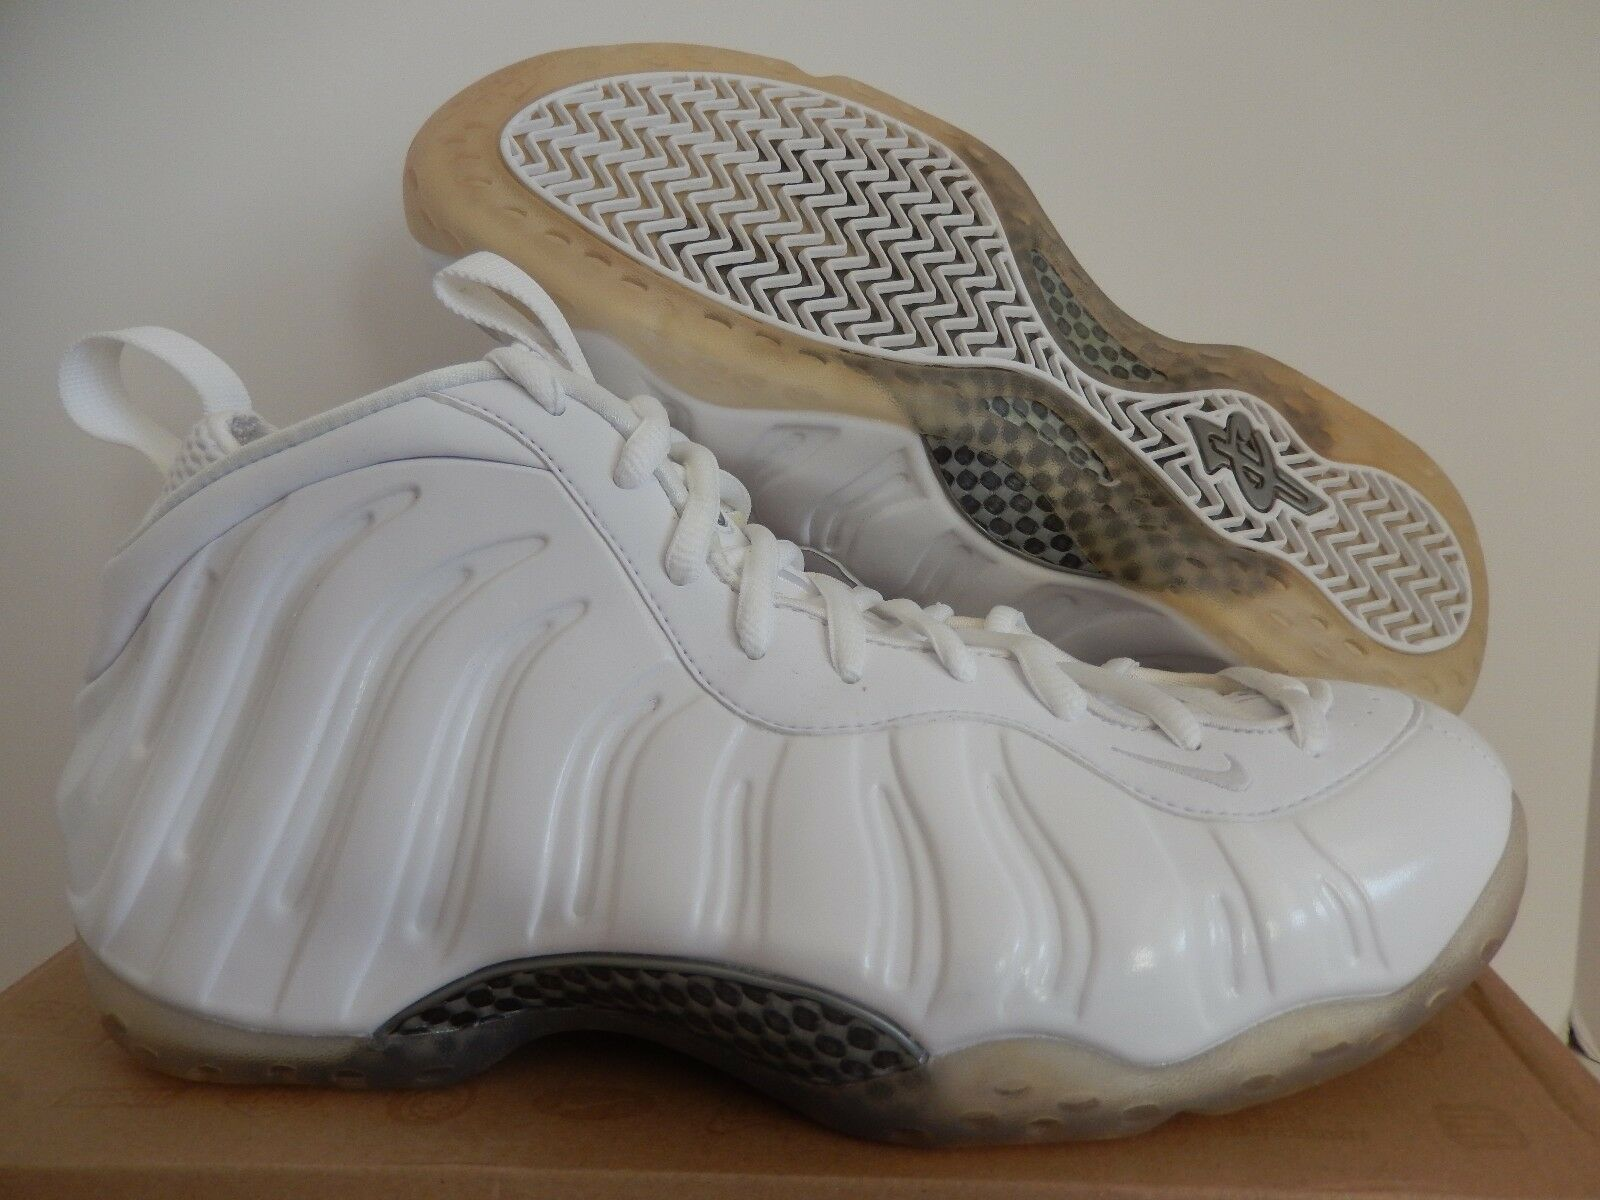 Nike price Air Foamposite One Blanco-Blanco-metallic Plata price Nike reduction Wild Casual Shoes b994d7